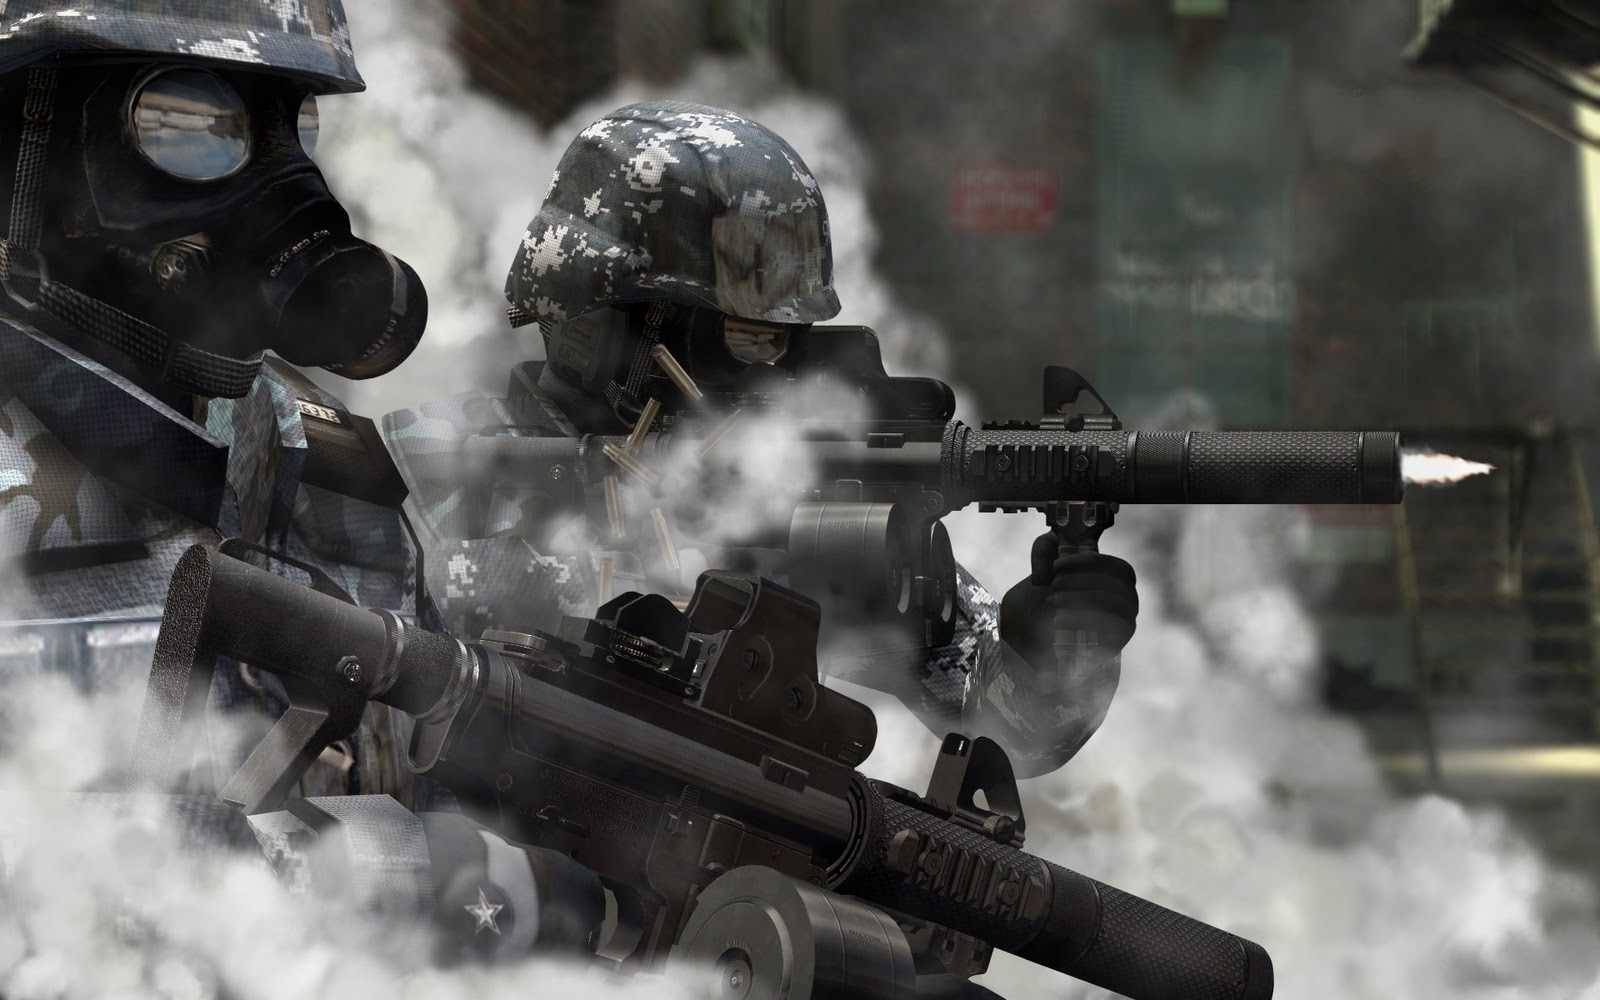 http://3.bp.blogspot.com/-QaHzgHDrvlY/Tv1Px6huycI/AAAAAAAAA3g/5pO9hUowEqw/s1600/Guns+Wallpaper+%252821%2529.jpg